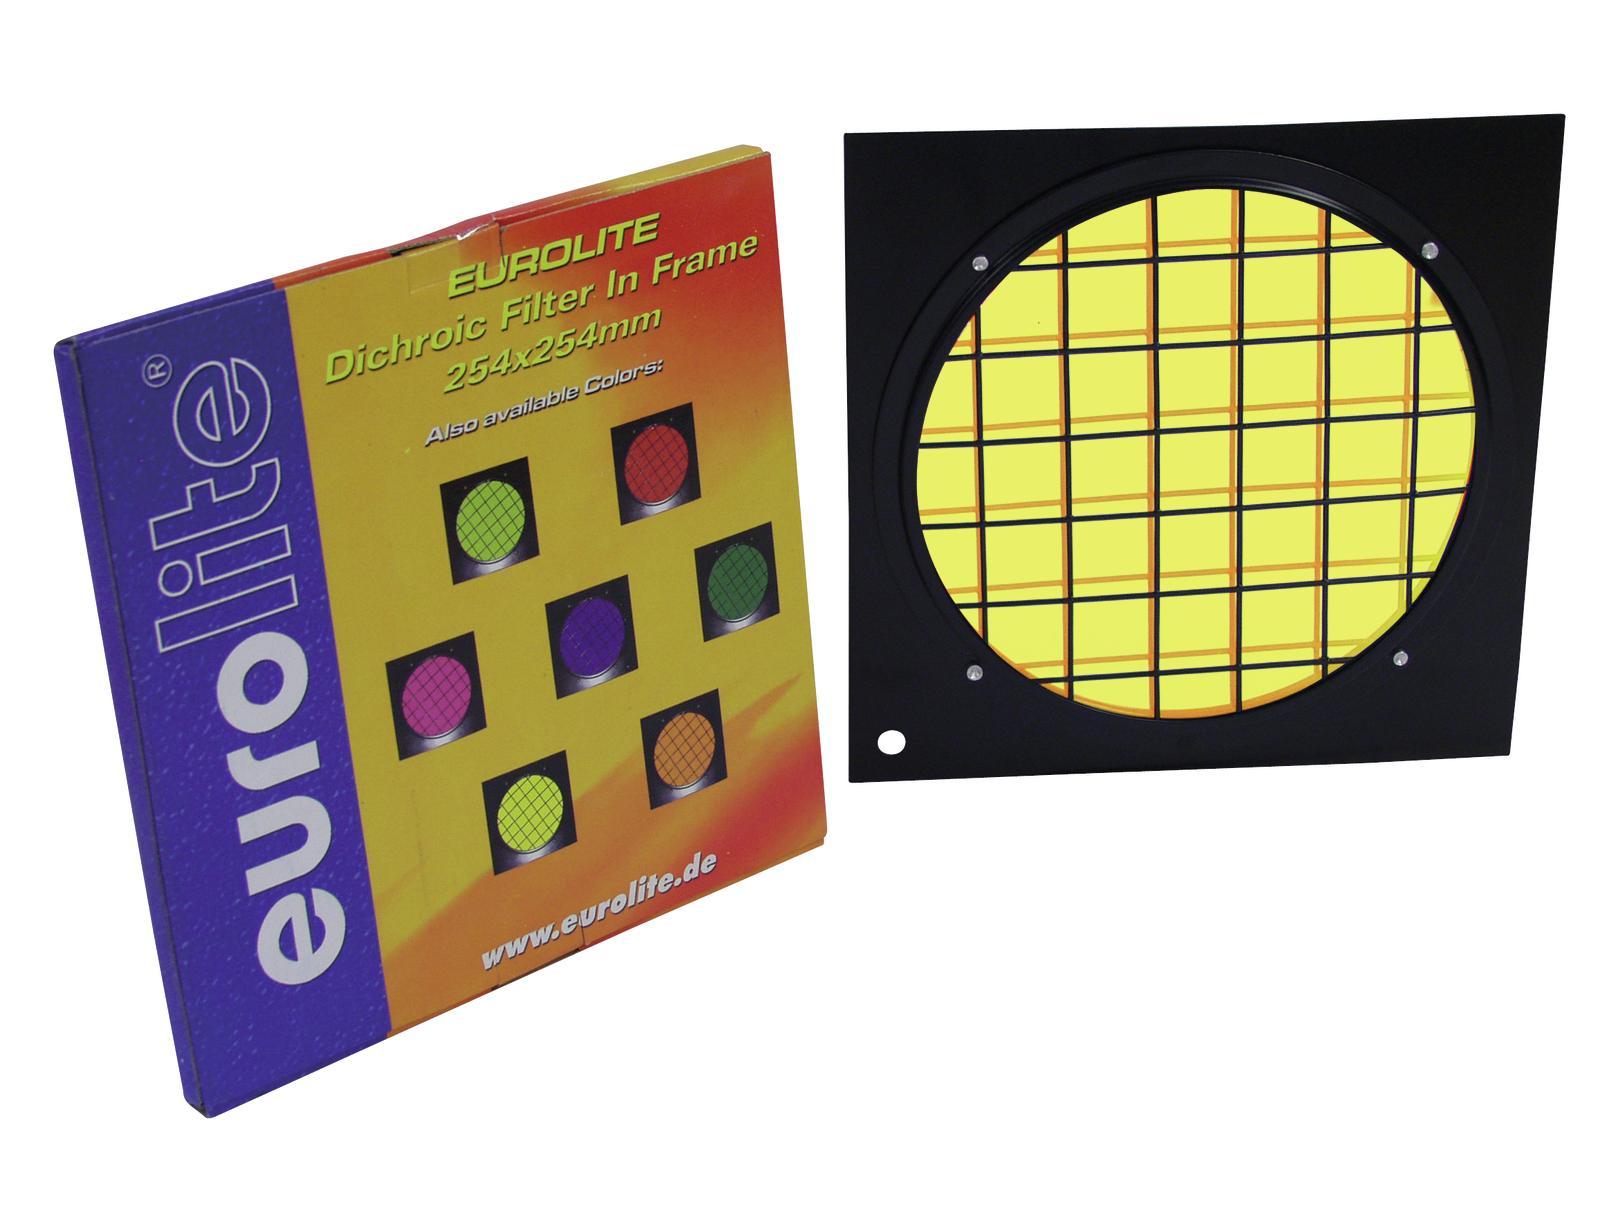 Filter, Dichroic, For PAR 64 profi-spot 254 x 254 mm EUROLITE Yellow